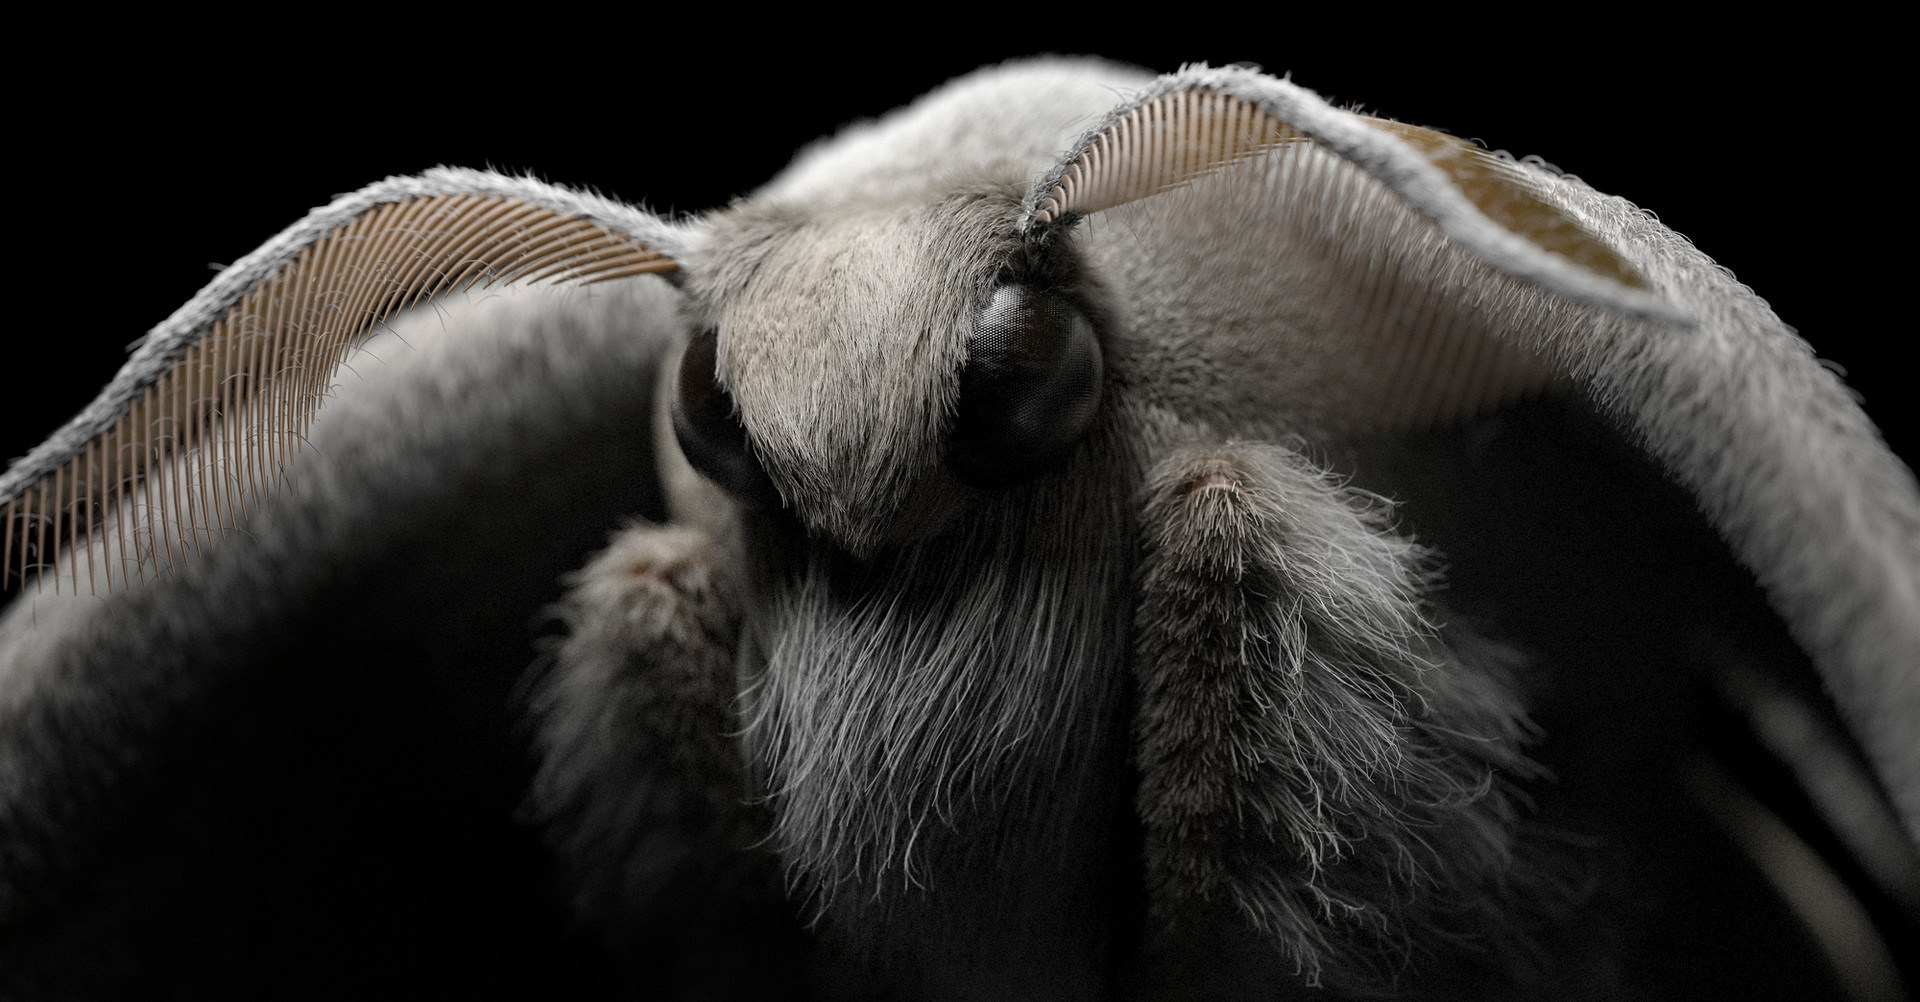 Moth 3D CGI Render Illustration